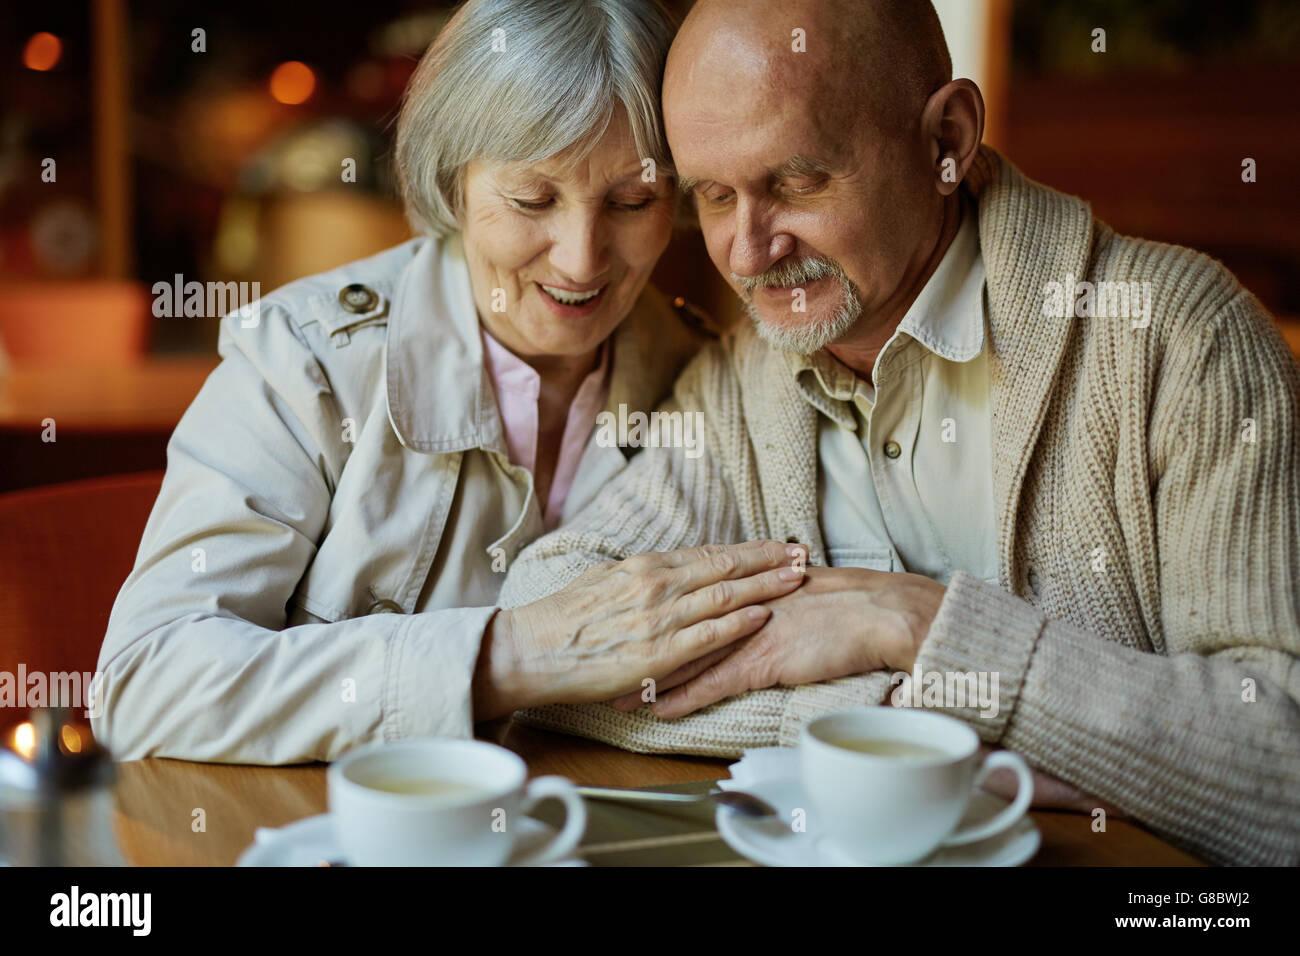 Affectionate couple Photo Stock